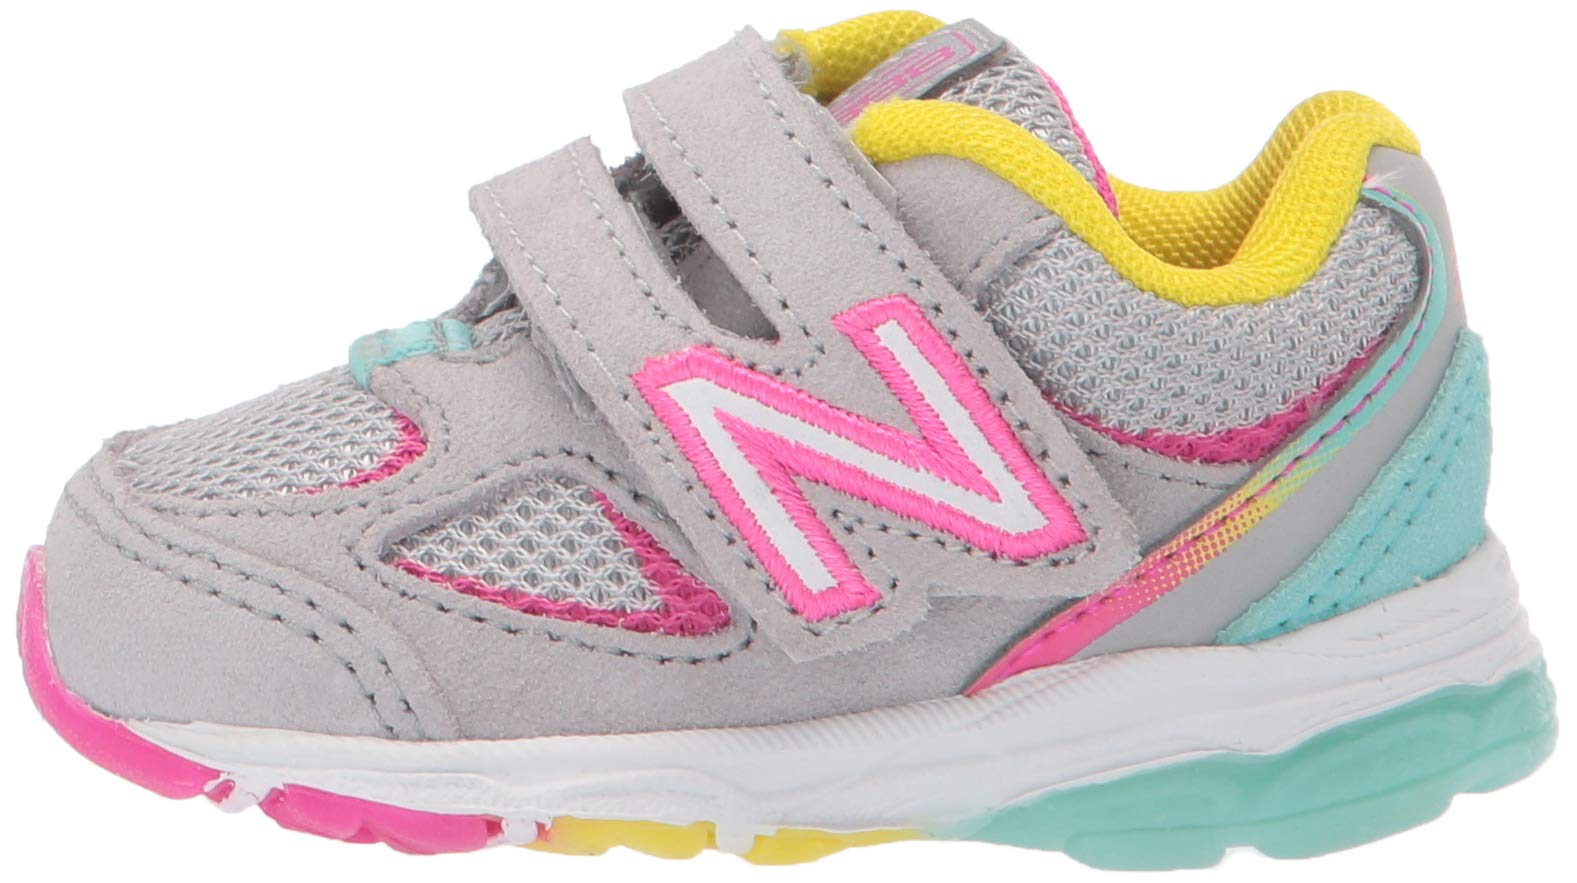 New Balance Girls' 888v2 Hook and Loop Running Shoe, Grey/Rainbow, 2 W US Infant by New Balance (Image #5)